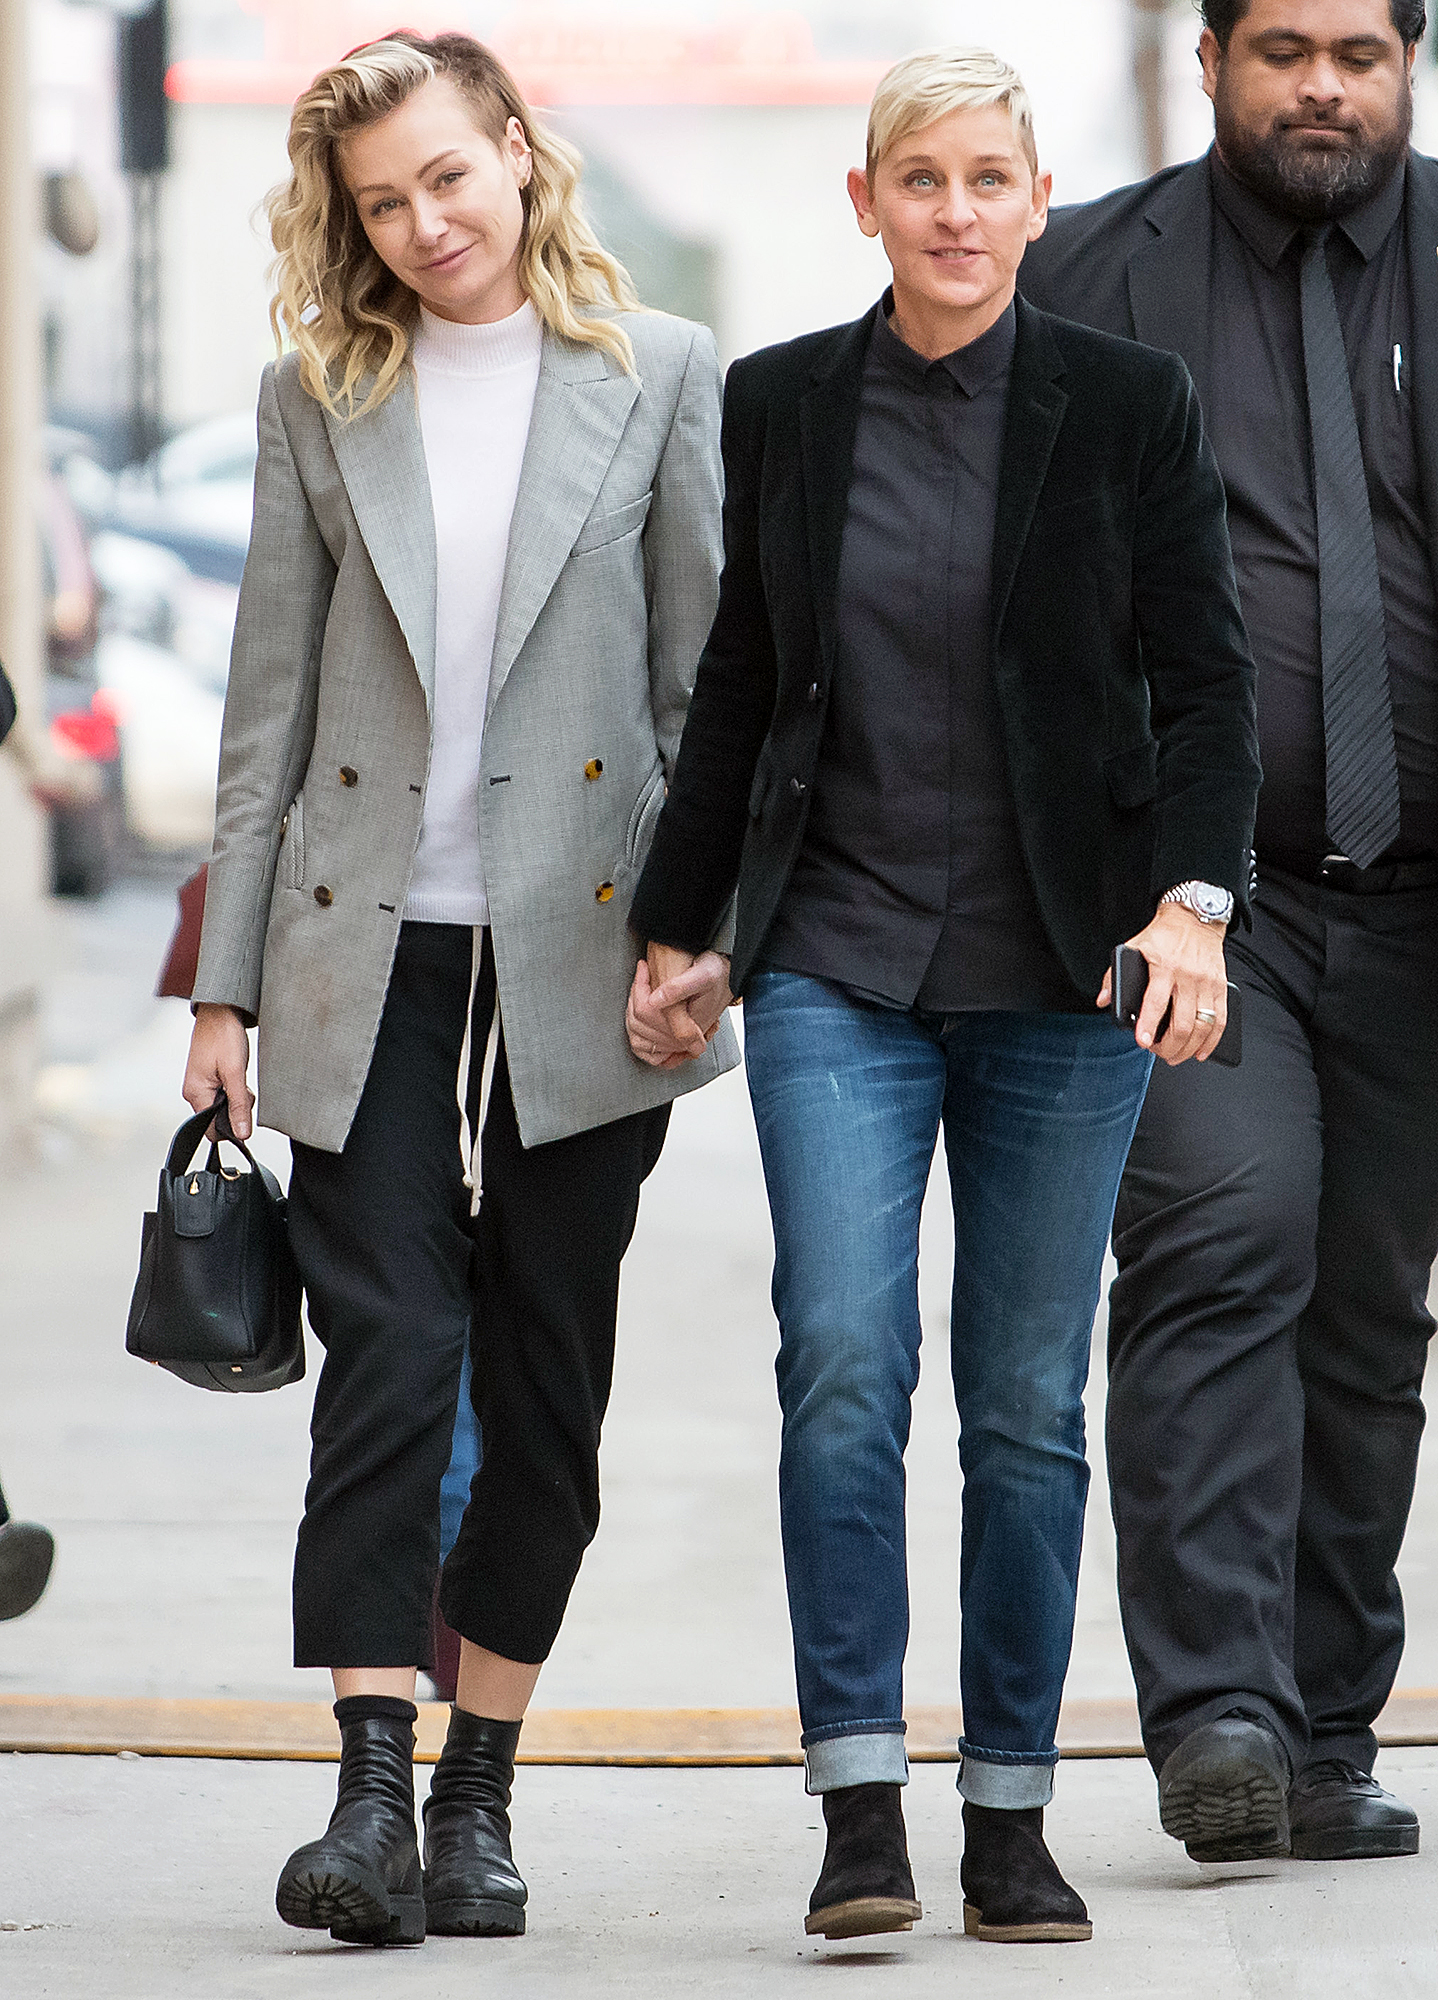 Portia de Rossi Urging Ellen DeGeneres to Leave Talk Show - Portia de Rossi and Ellen DeGeneres arrive at 'Jimmy Kimmel Live' in Los Angeles on December 10, 2018.